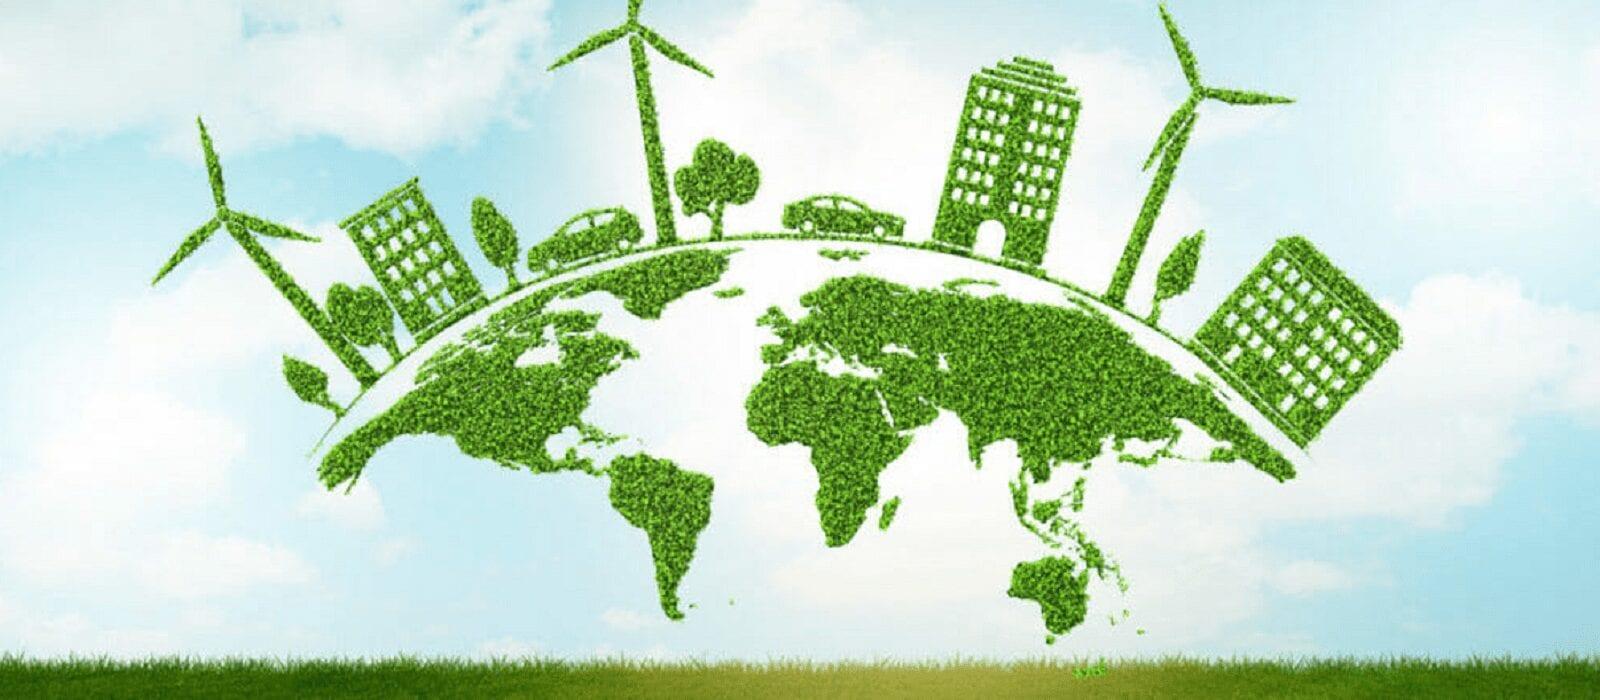 localtapiola-sustainable-green-carbon